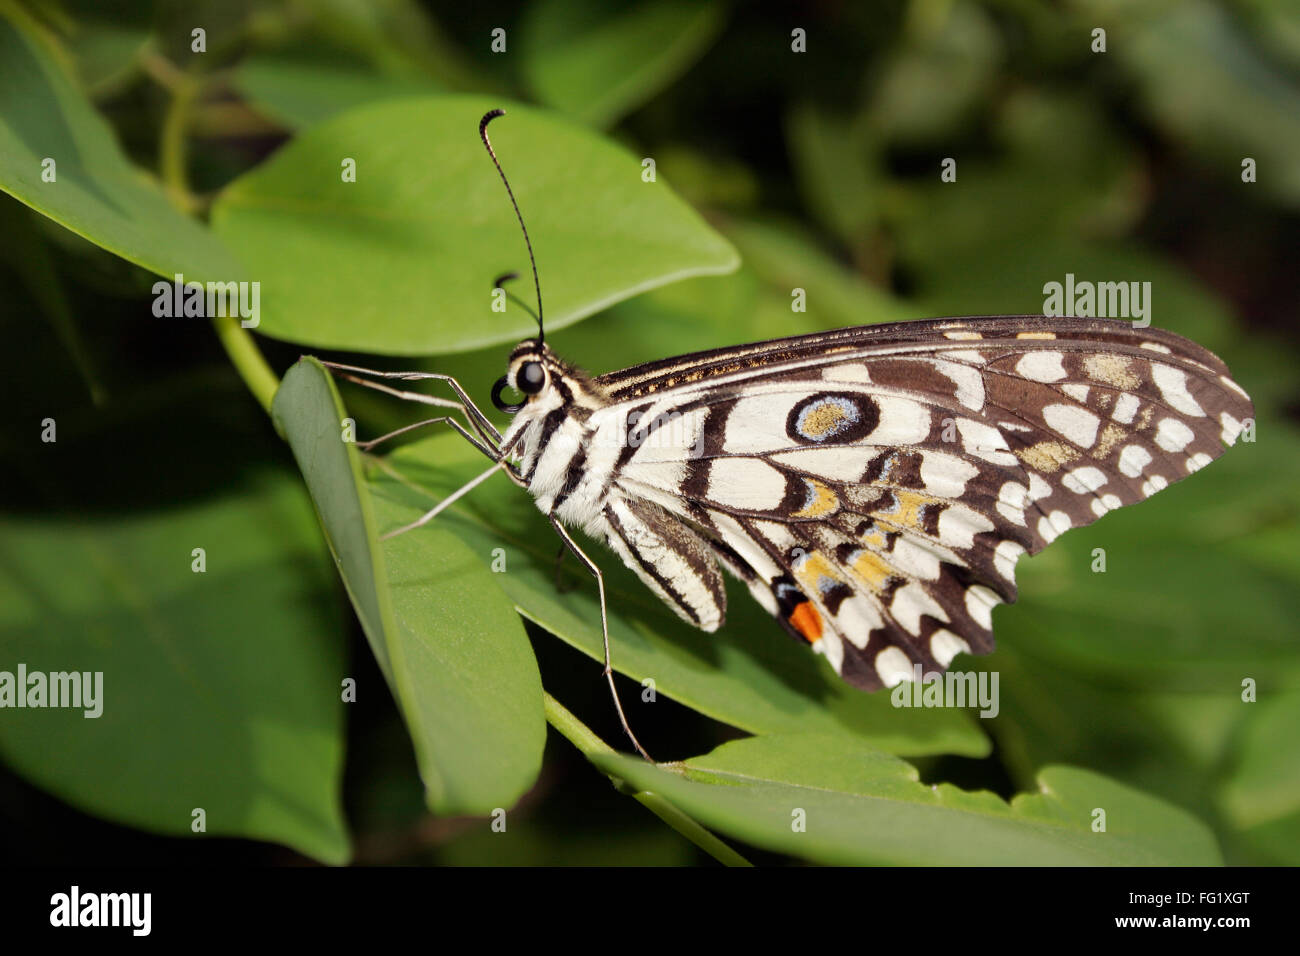 Insect , butterfly Lime Butterfly ii princeps demoleus libanius ii fruhstorferij - Stock Image